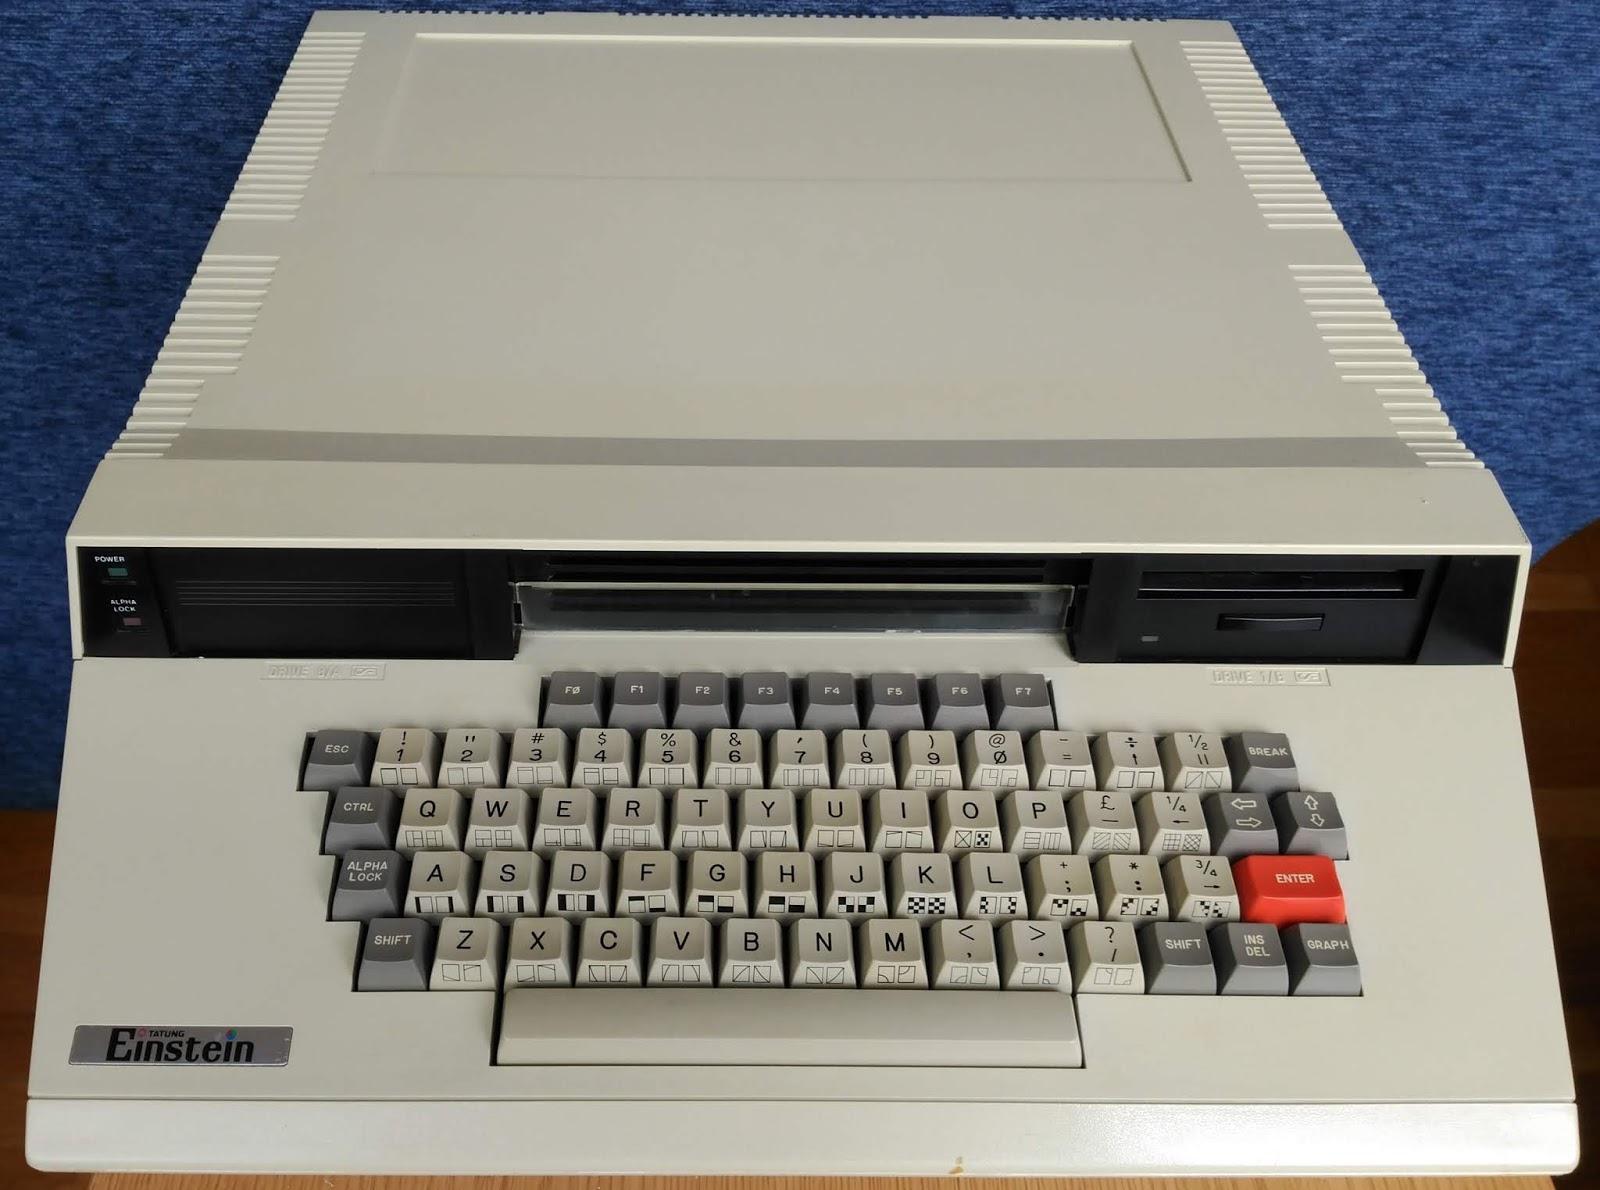 small resolution of enlace al ordenador tatung einstein